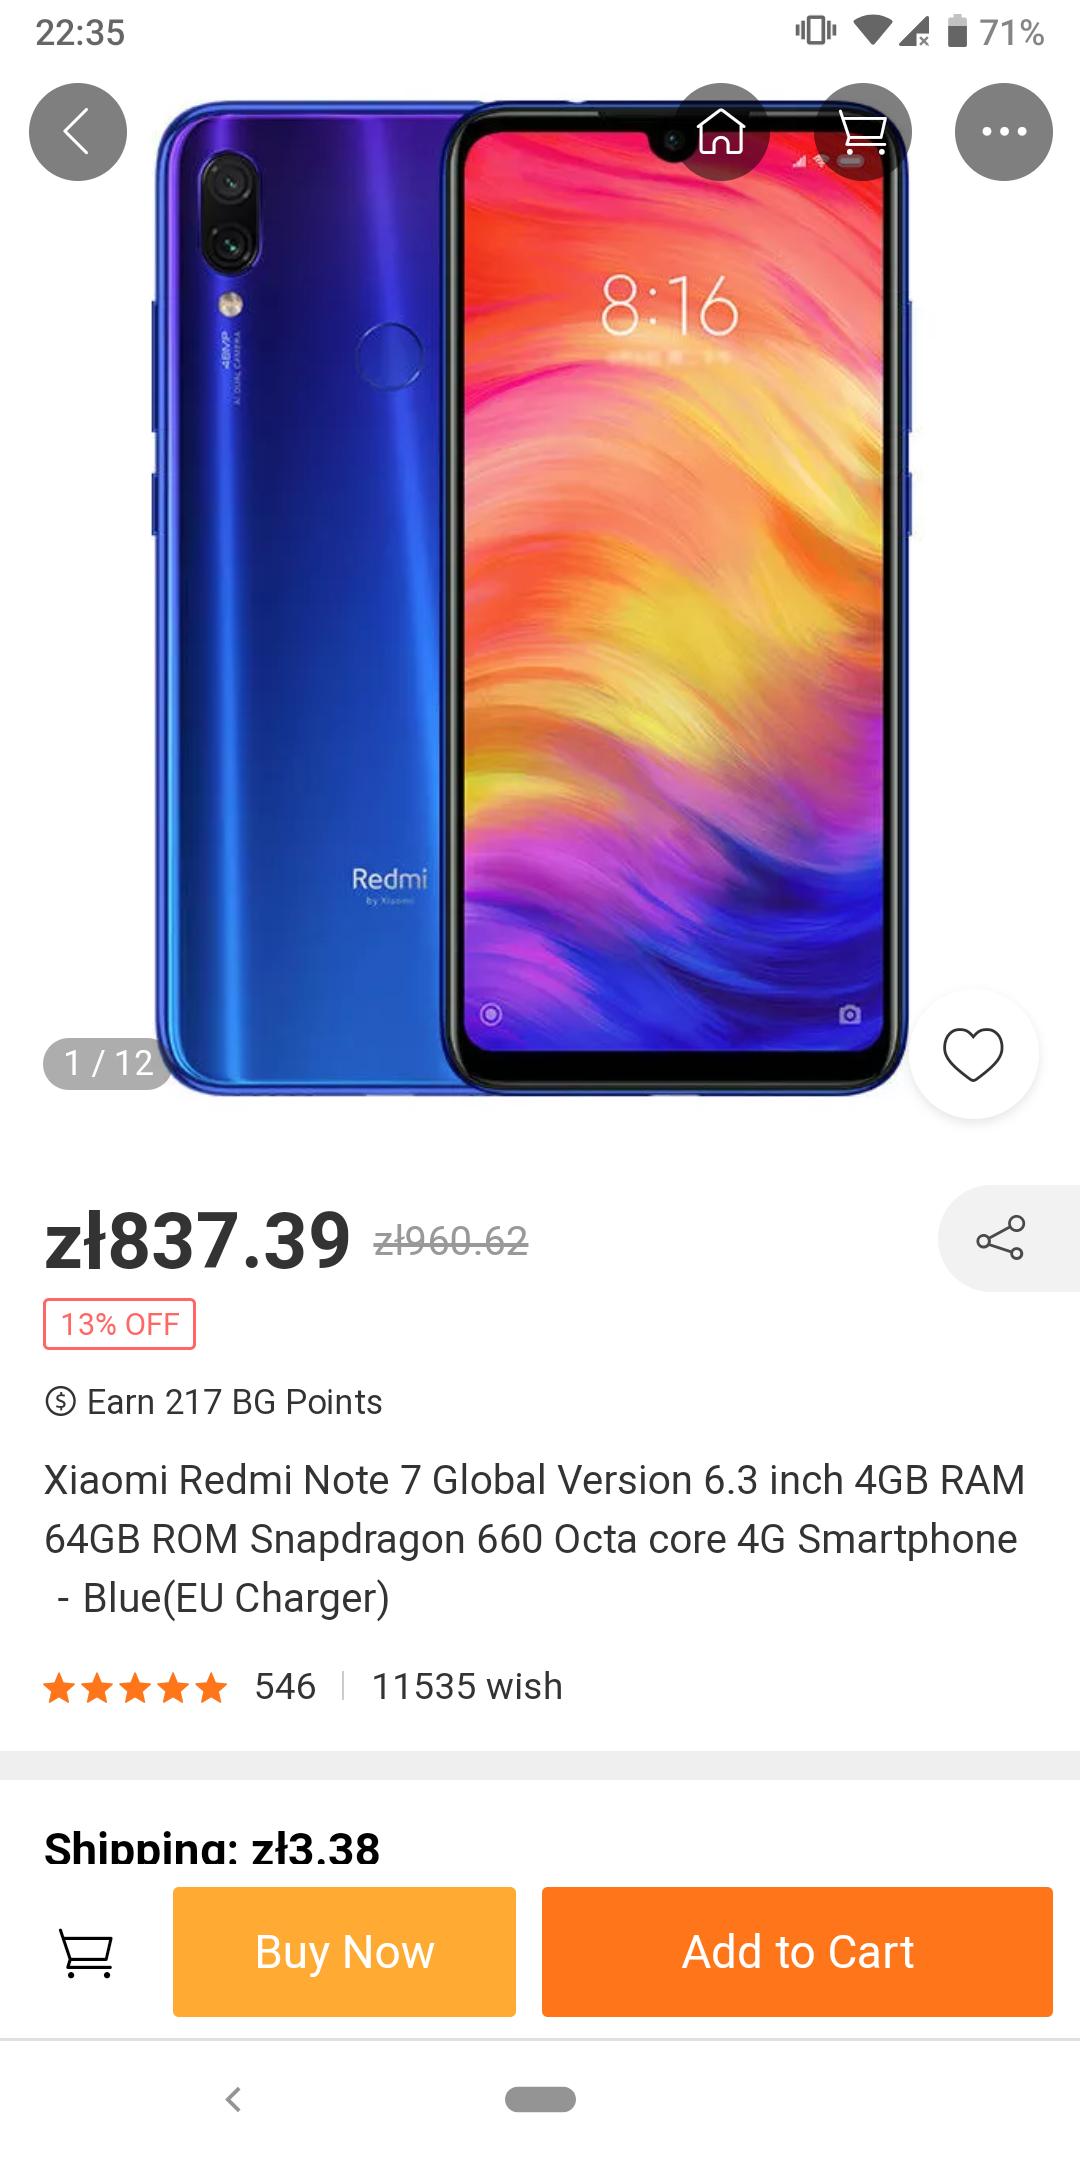 Smartfon Xiaomi Redmi Note 7 4/64 SD660